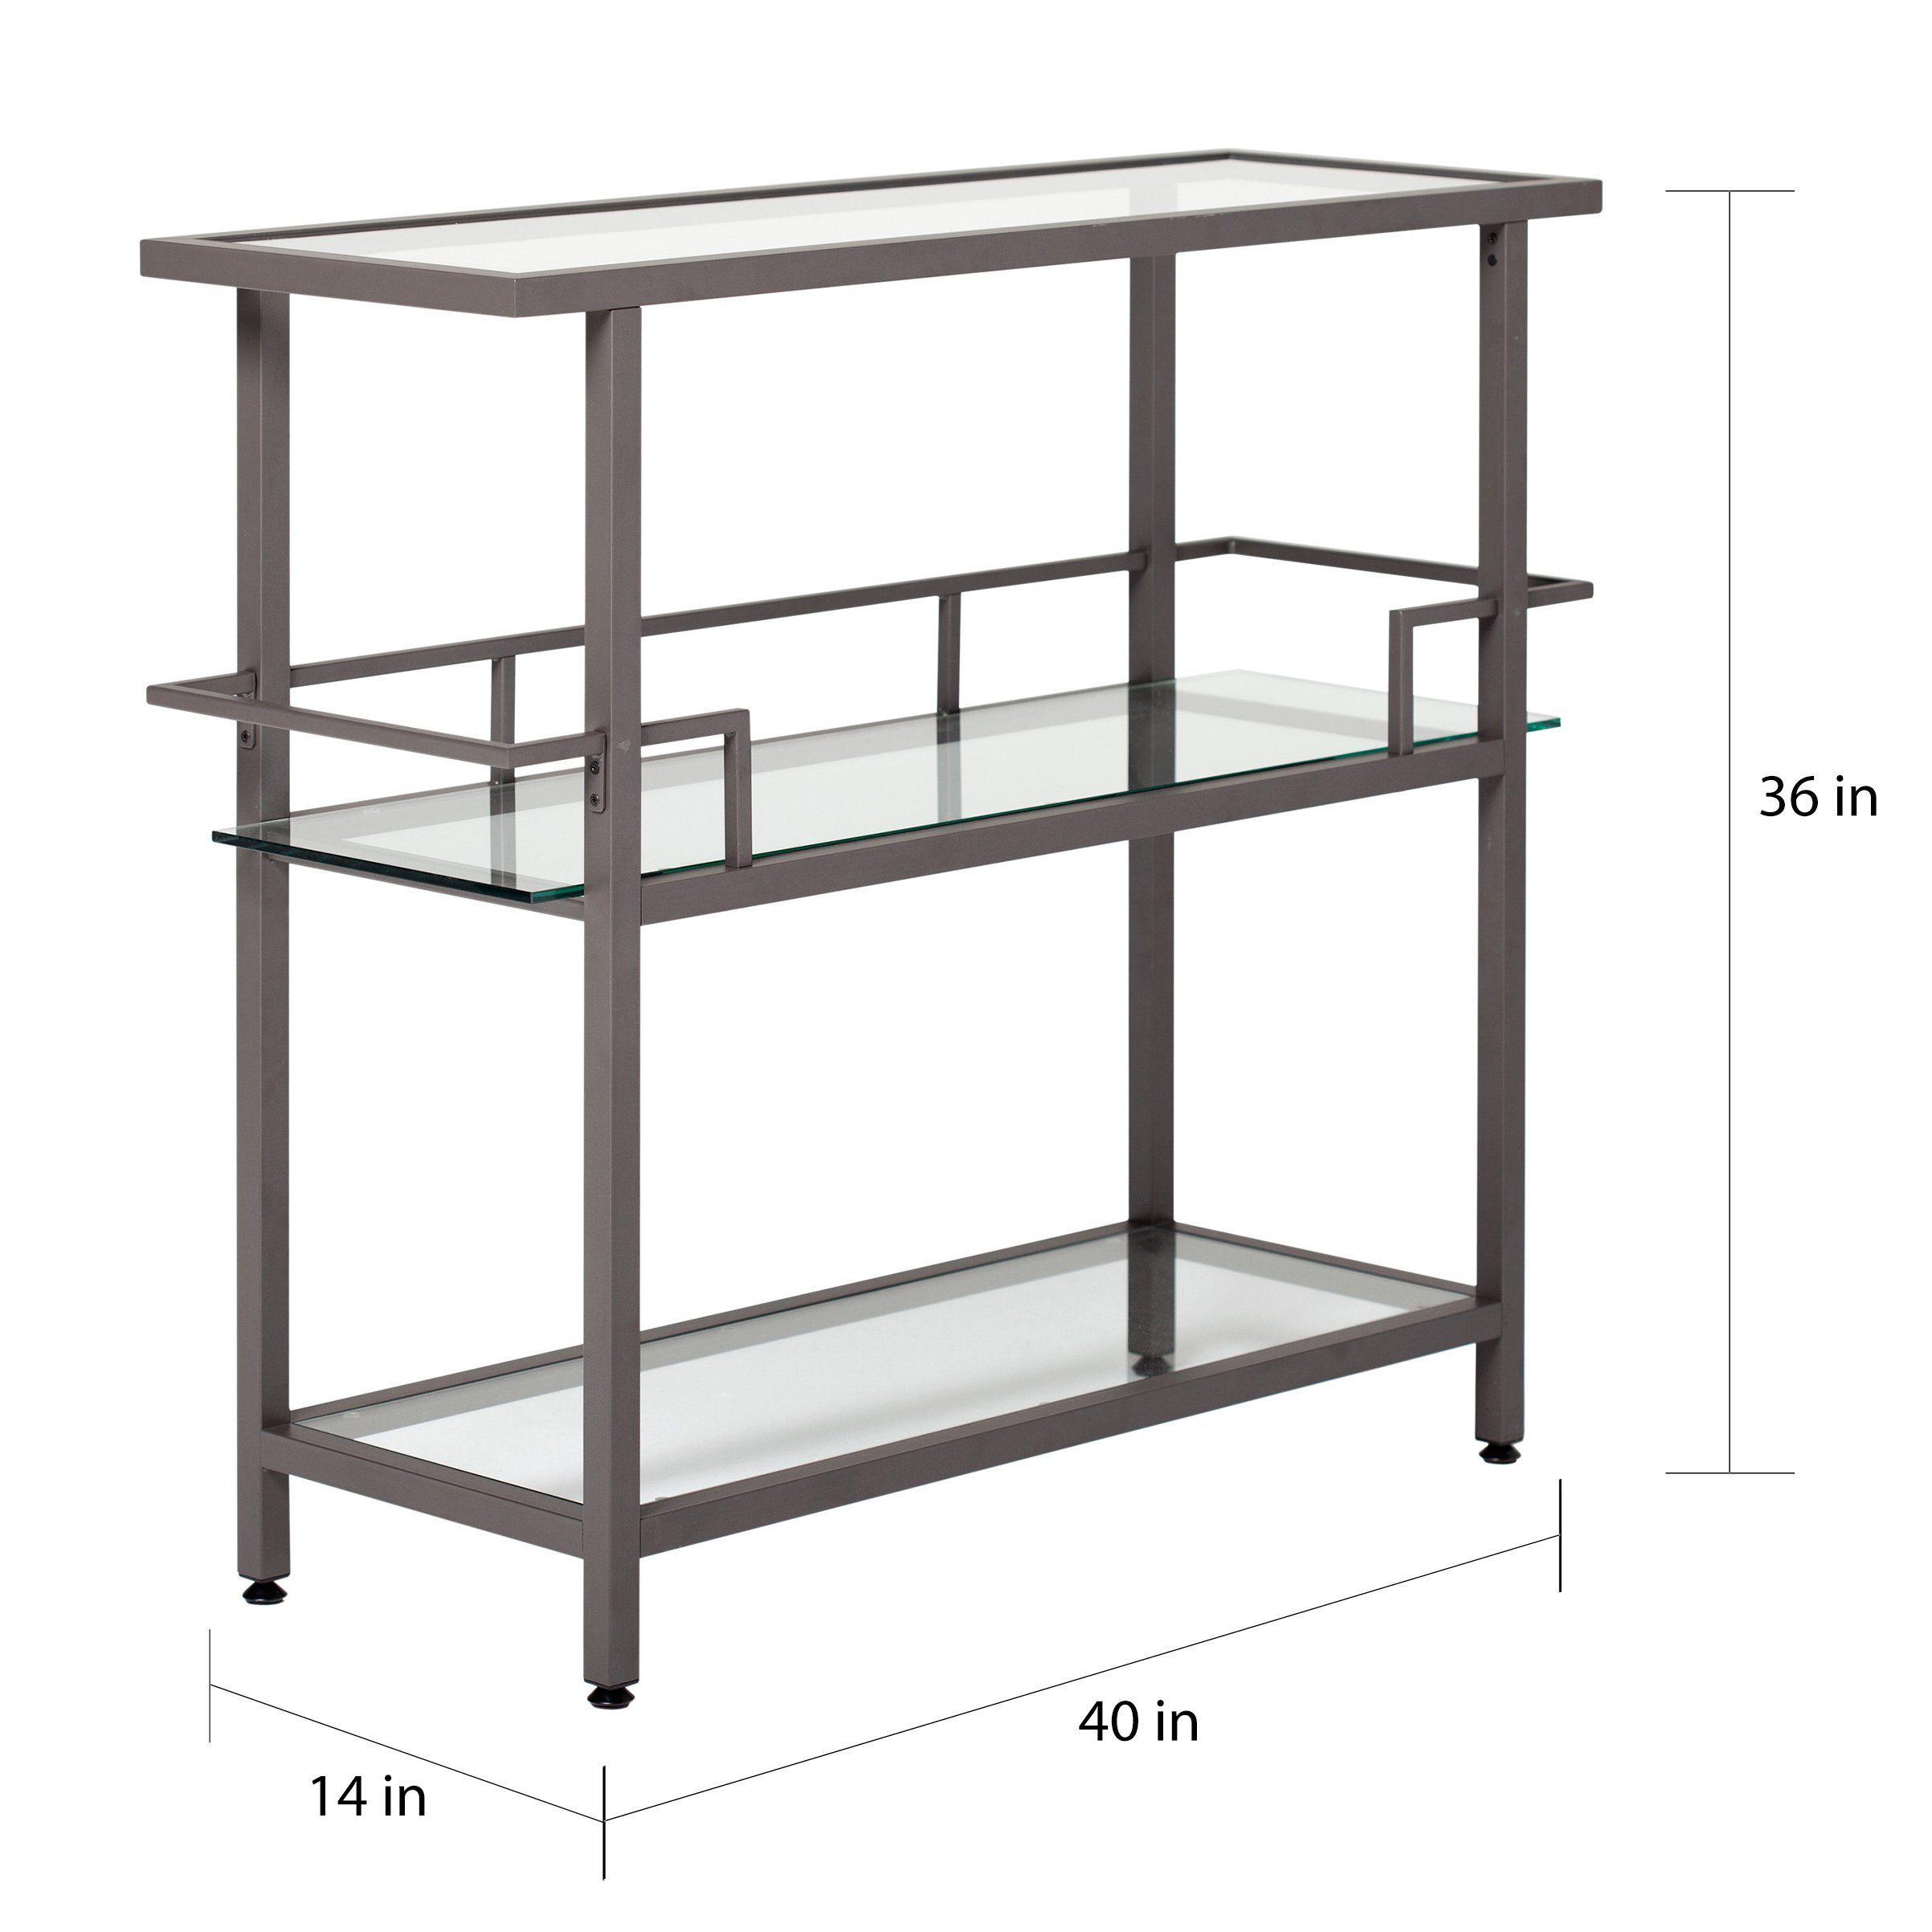 Overstock Com Online Shopping Bedding Furniture Electronics Jewelry Clothing More Estante Prateleira Estante Prateleiras [ 2405 x 2405 Pixel ]